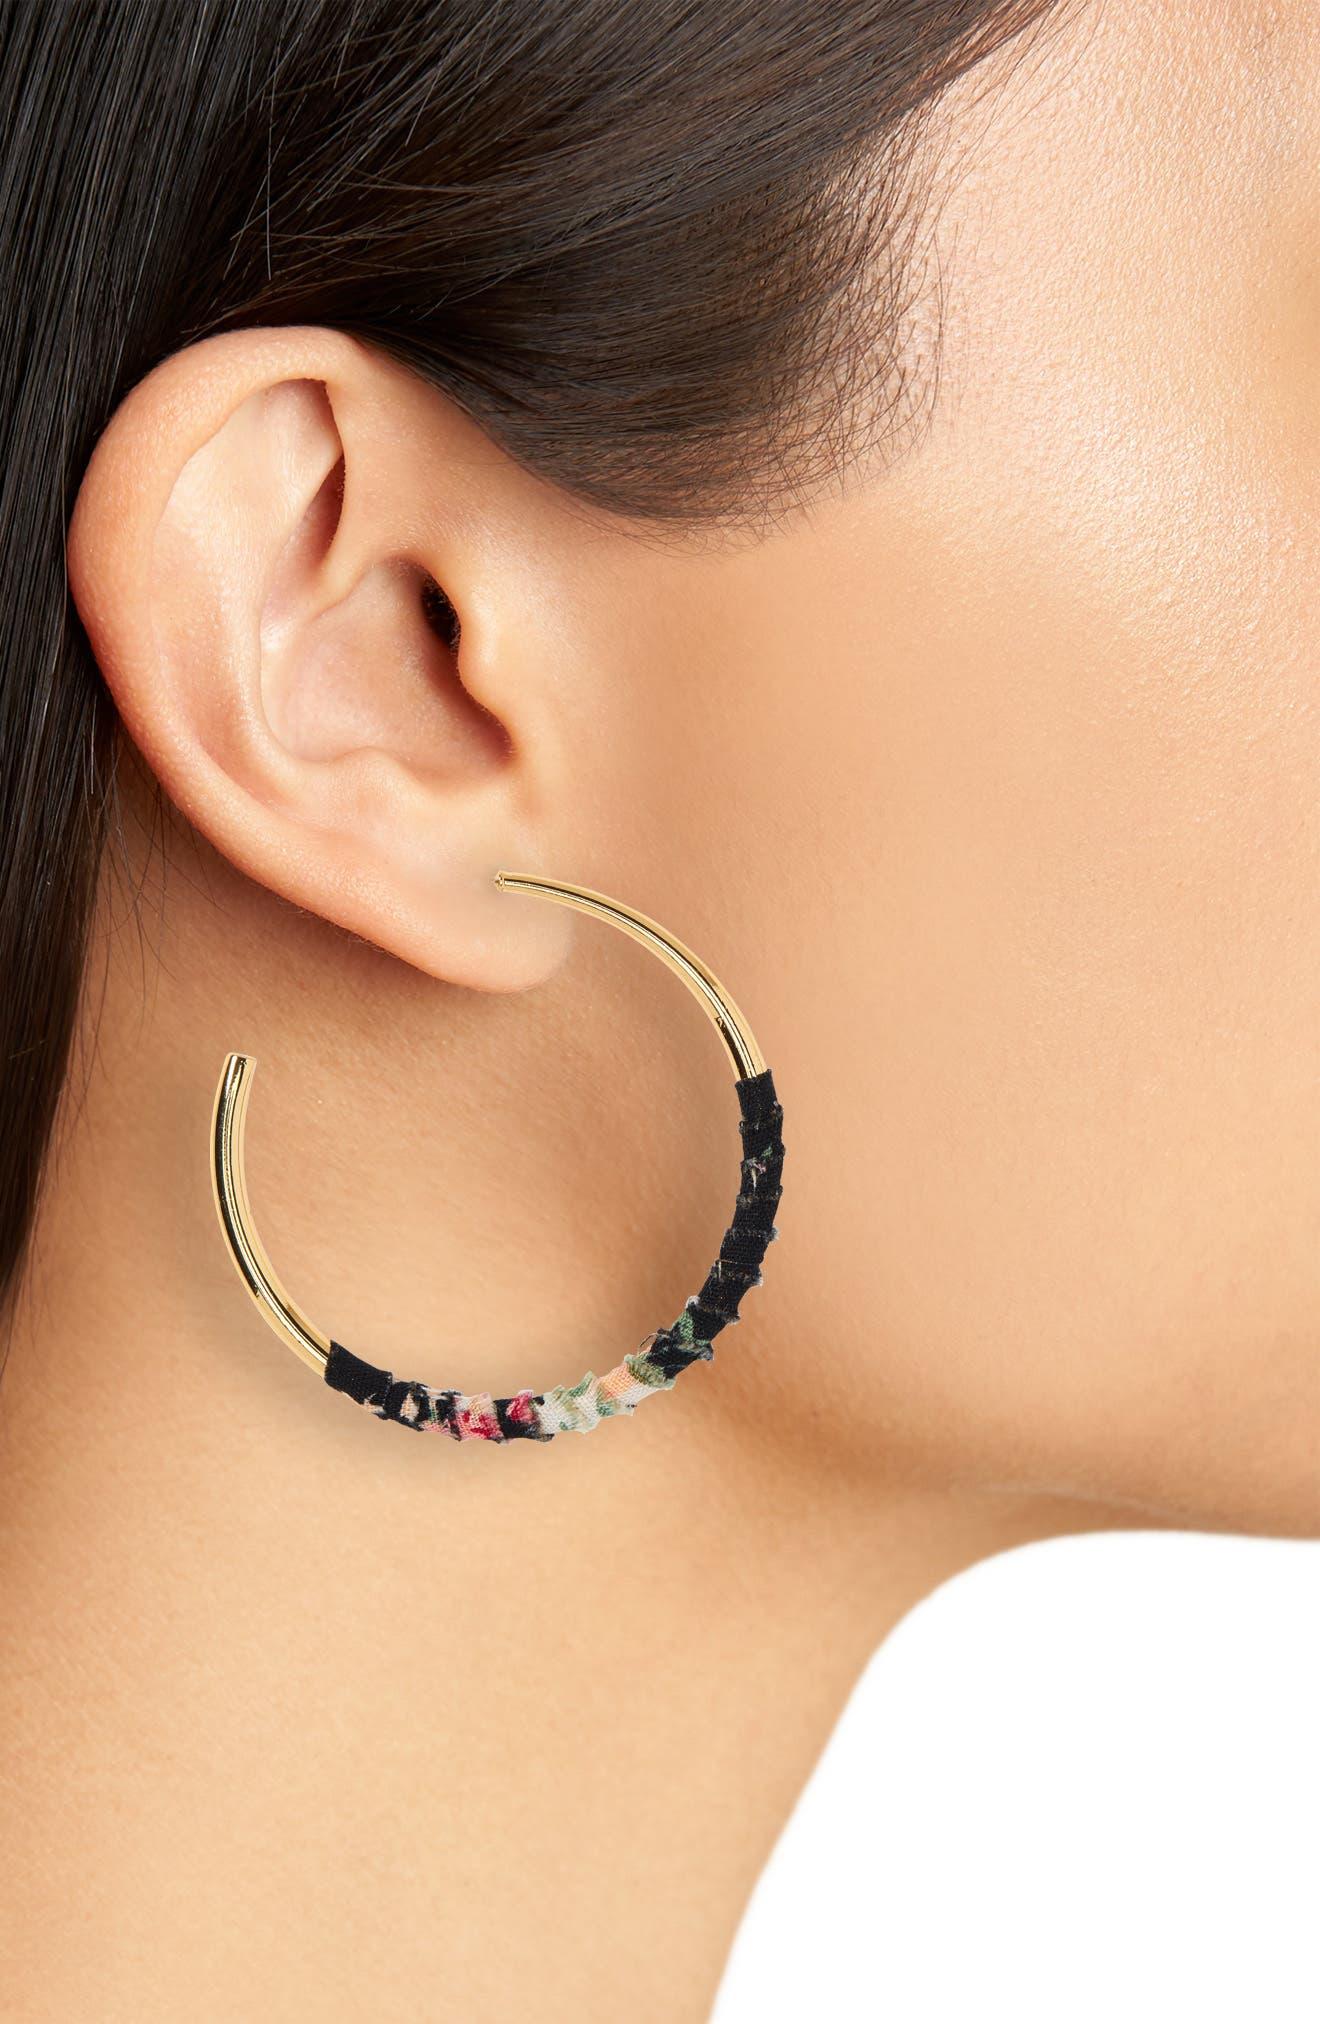 UNCOMMON JAMES BY KRISTIN CAVALLARI, Womanizer Hoop Earrings, Alternate thumbnail 2, color, 710